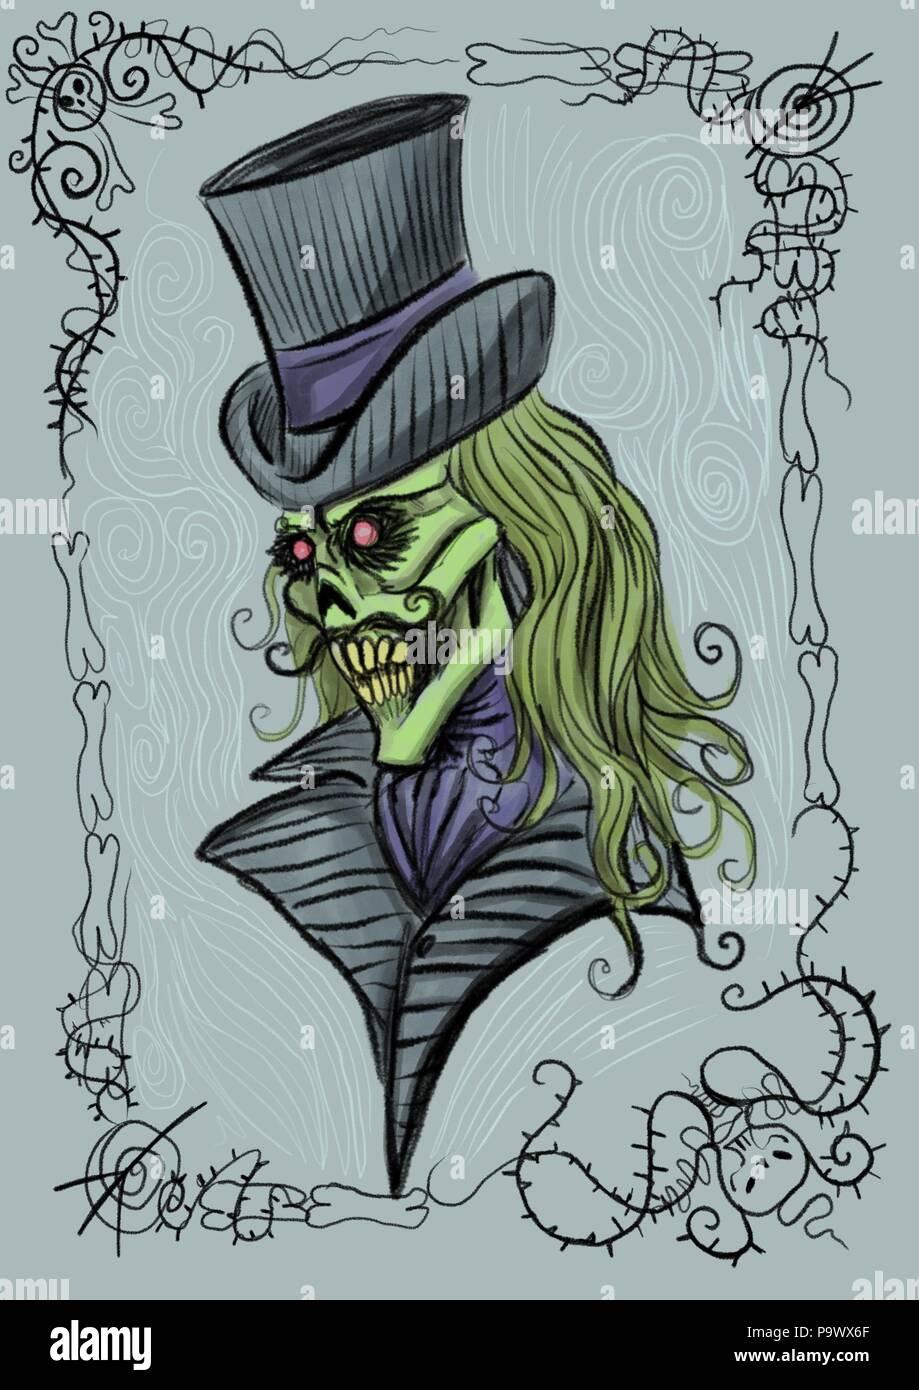 Voodoo Zombie Stock Photos & Voodoo Zombie Stock Images - Alamy